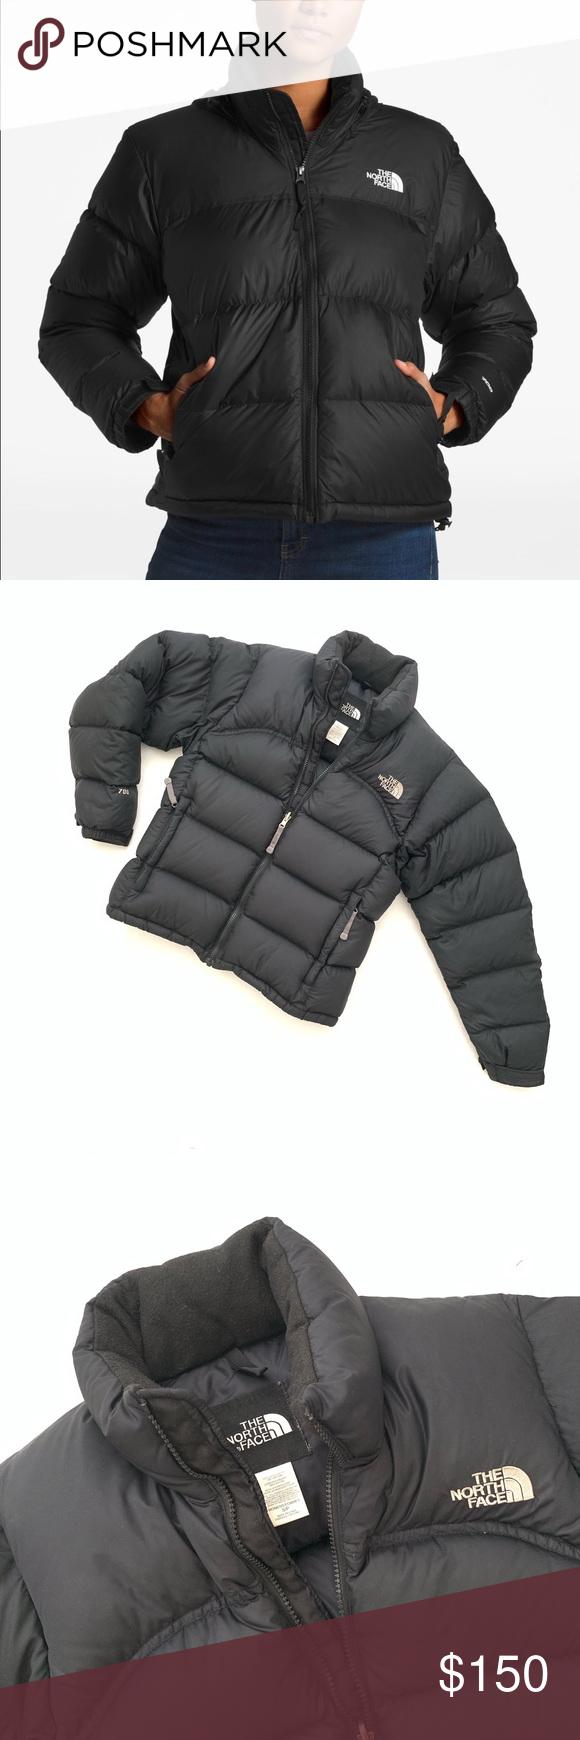 The North Face Nuptse 700 Goose Down Jacket Black North Face Nuptse Black North Face Fall Winter Coat [ 1740 x 580 Pixel ]